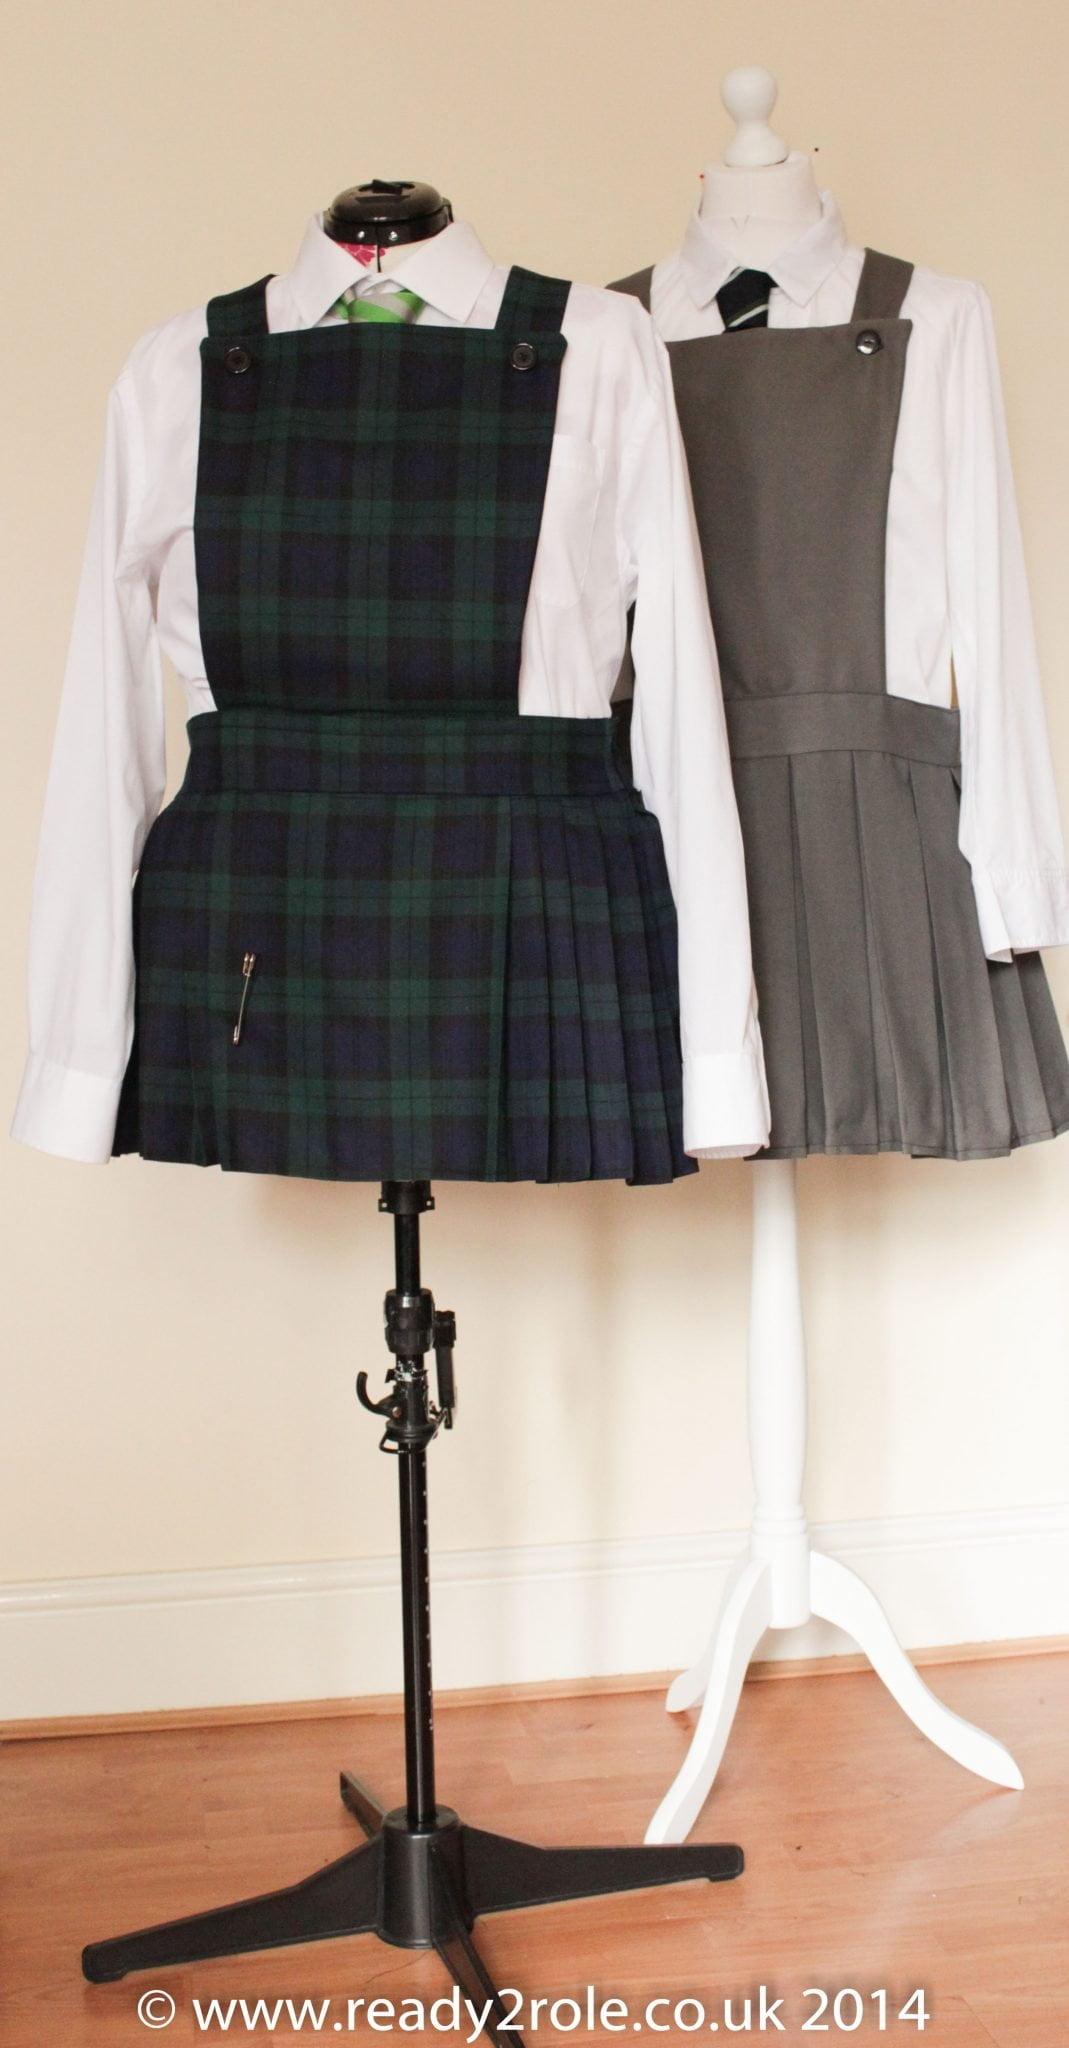 Adult School Uniform Dresses – Pinafore Style